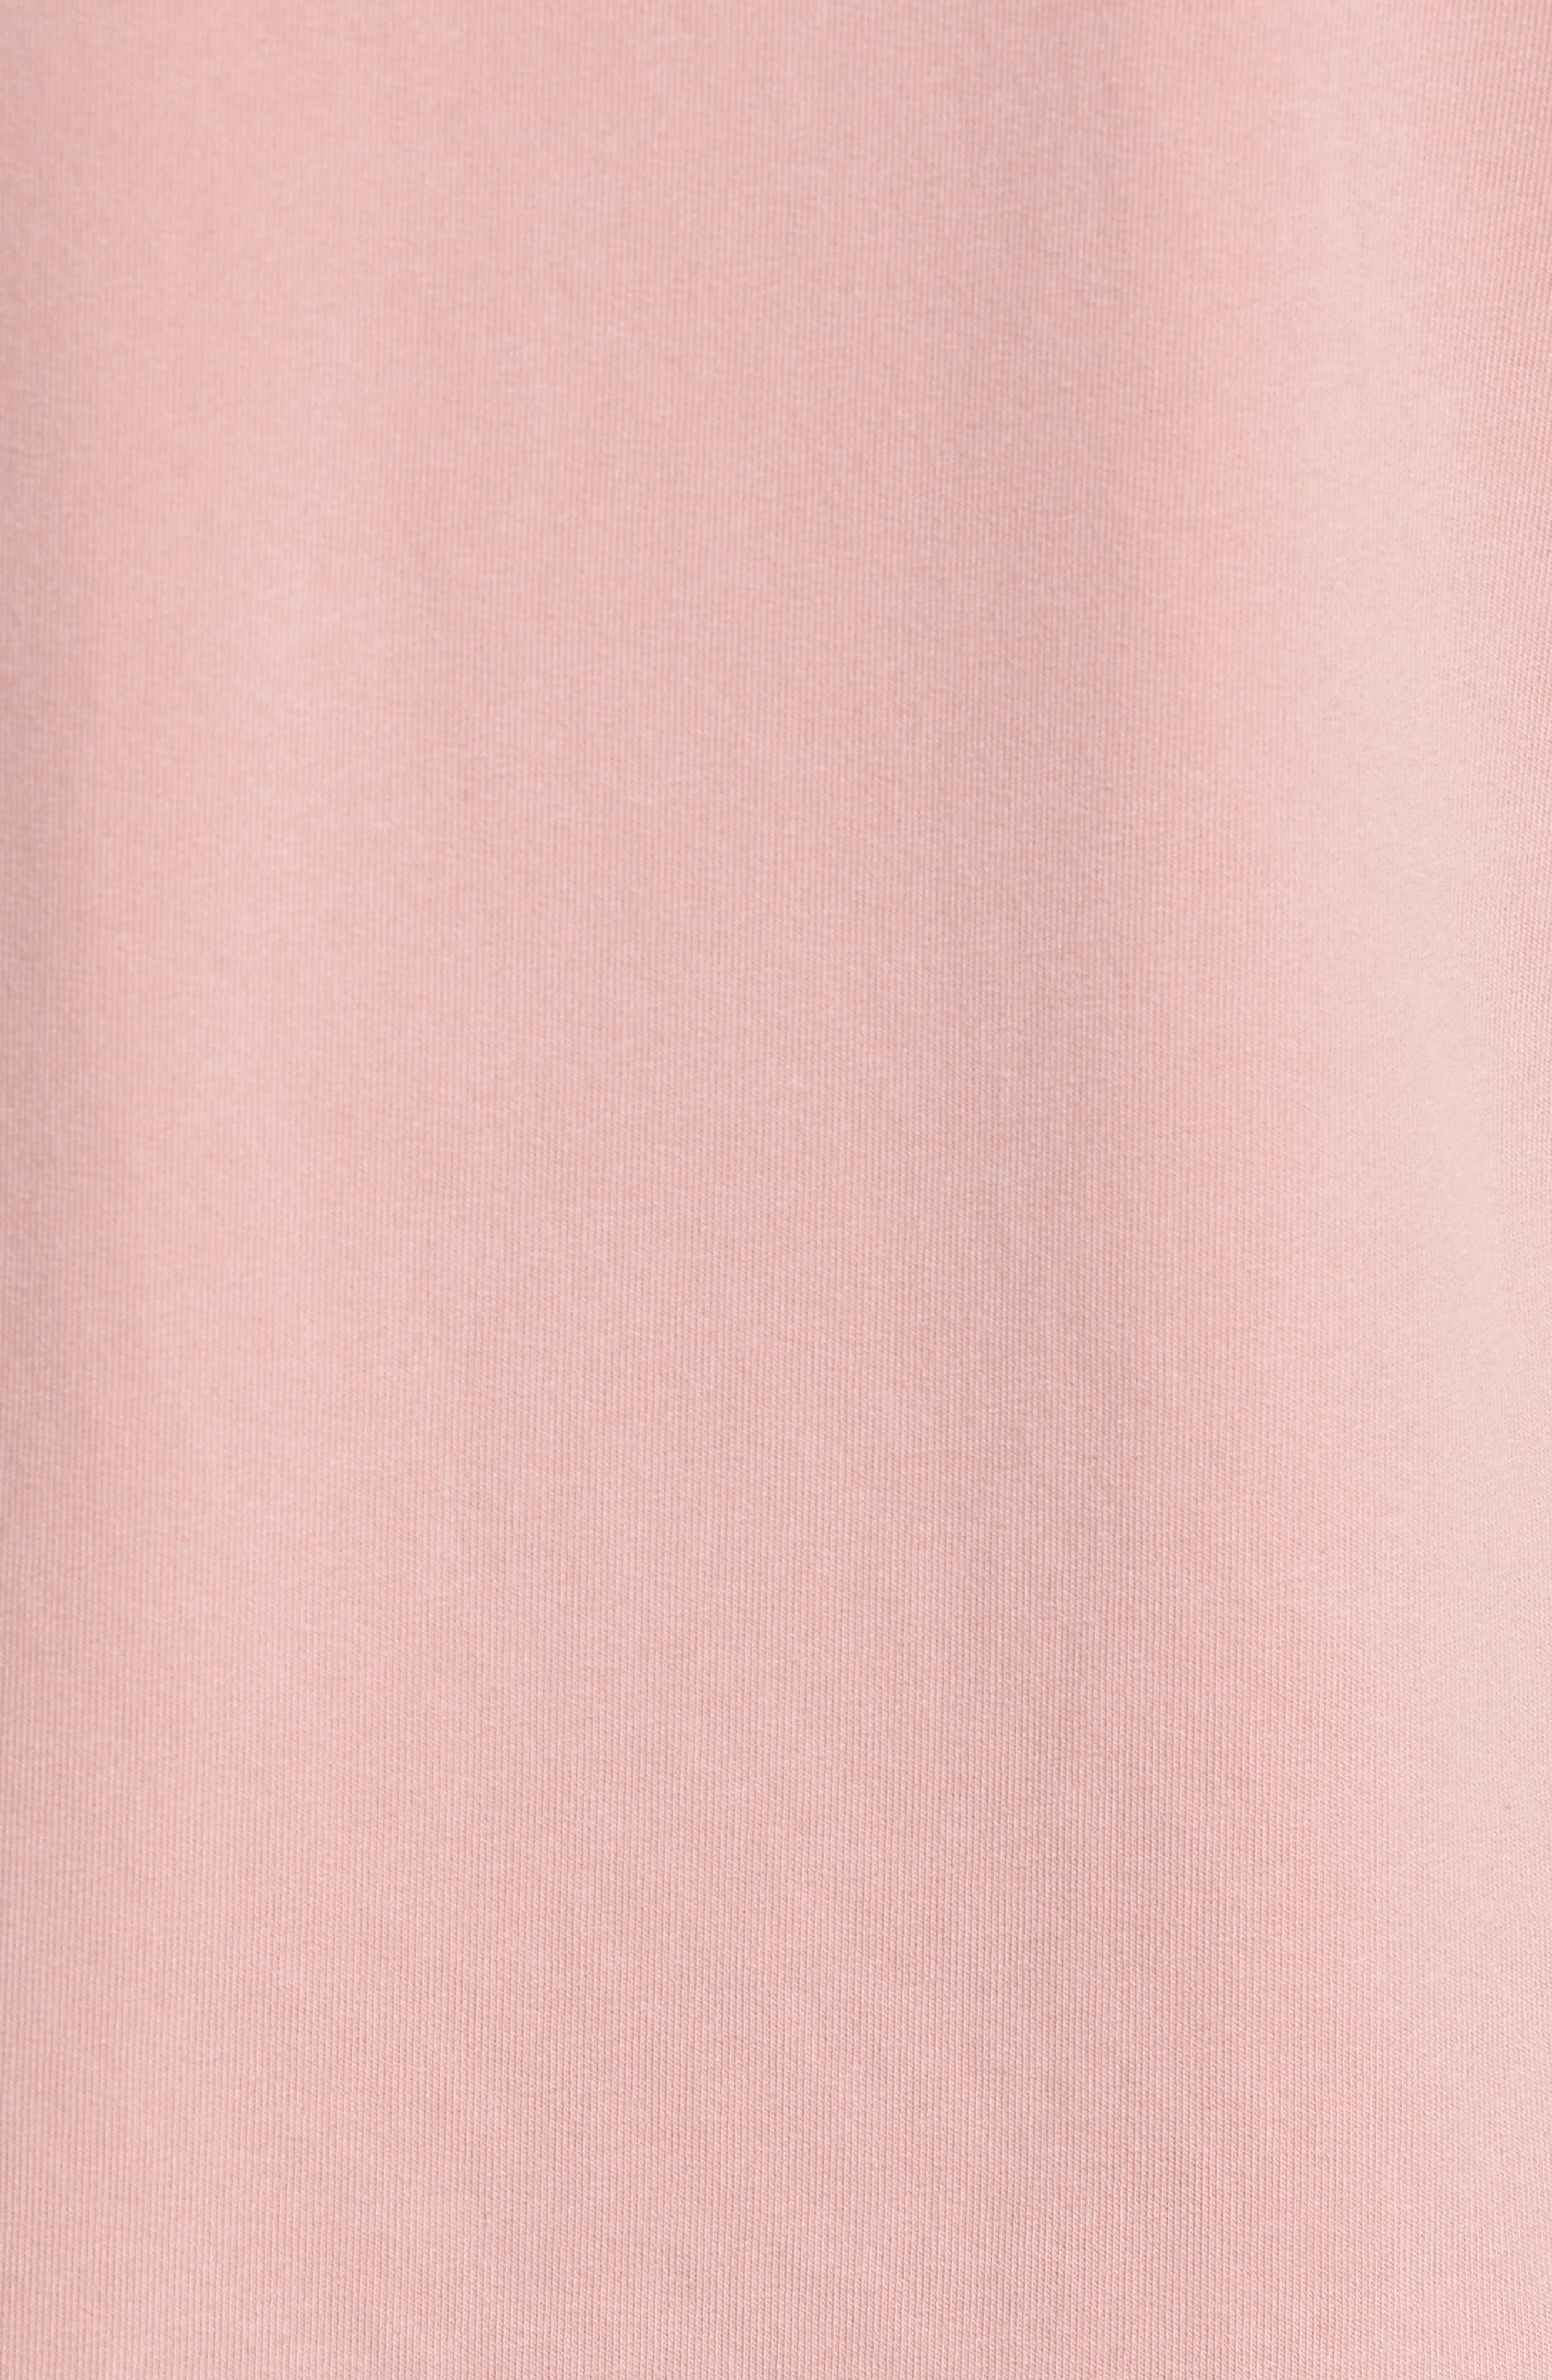 Slim Fit Crewneck Sweatshirt,                             Alternate thumbnail 5, color,                             Faded Rose